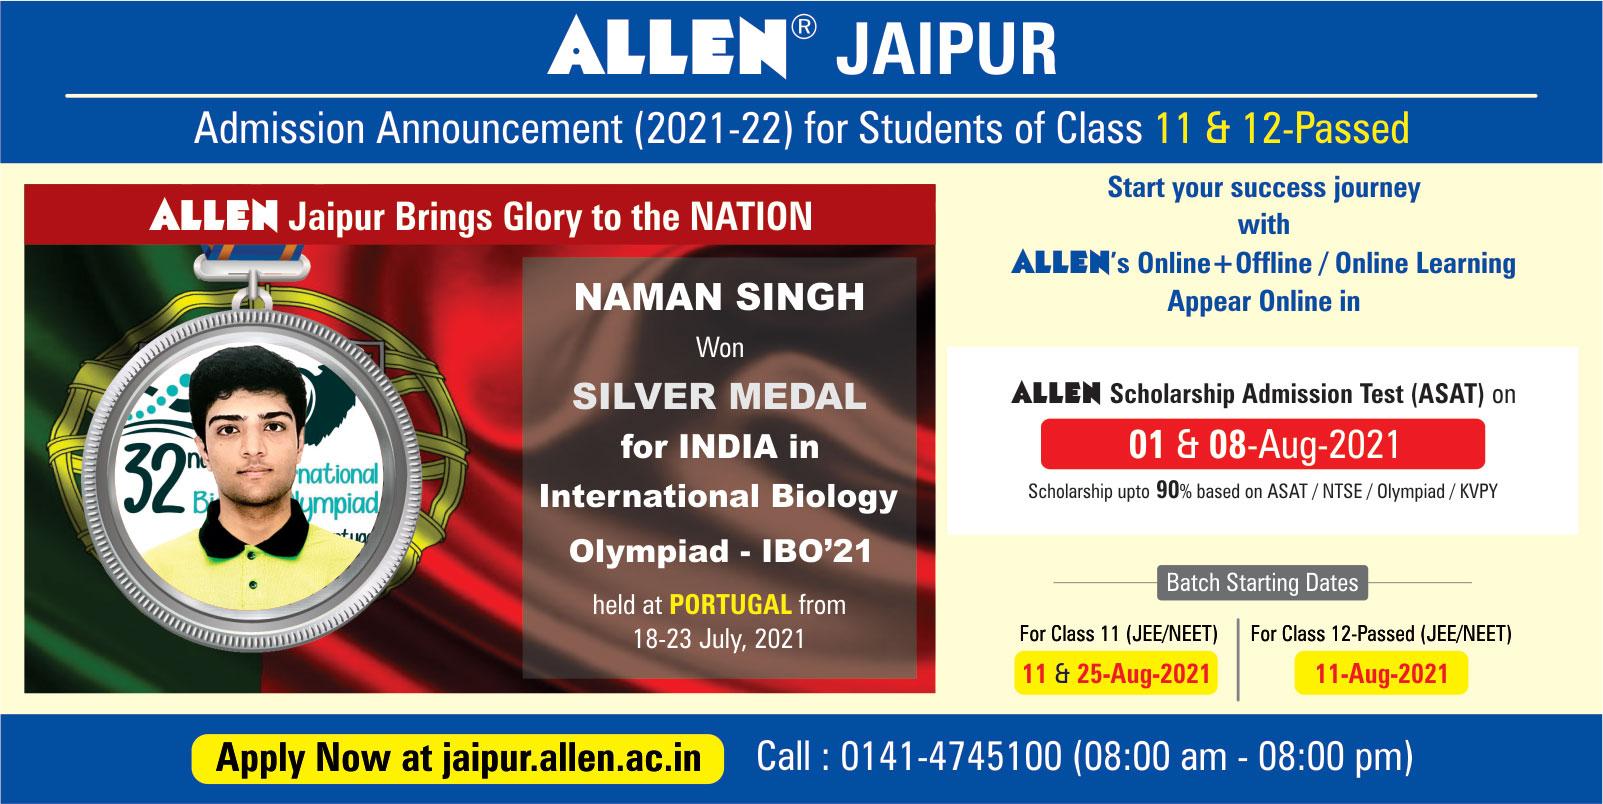 ALLEN Digital Course Starting Date_28Jul_1725